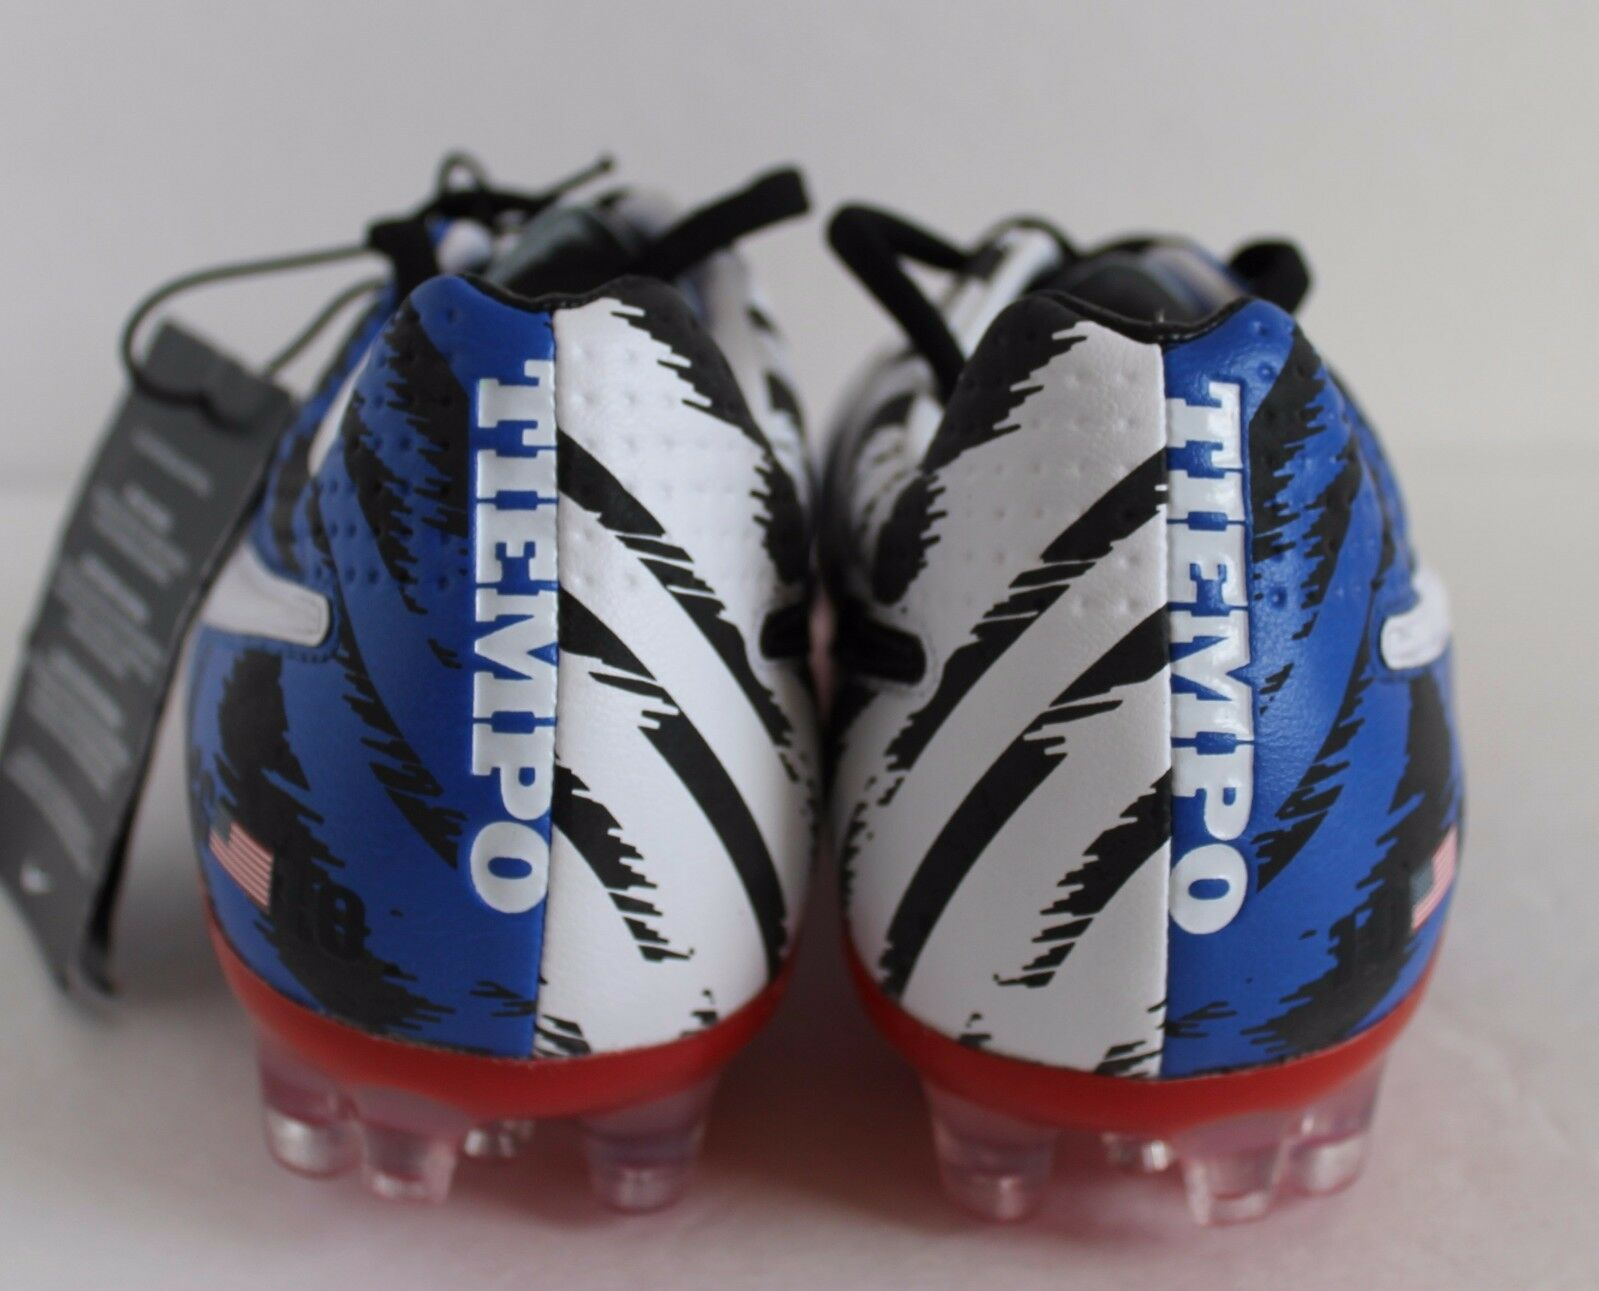 Nike femmes Tiempo Legacy AG Id Cleats SZ Bleu- blanc - Noir SZ Cleats 8 [653776-992] 51c7c4